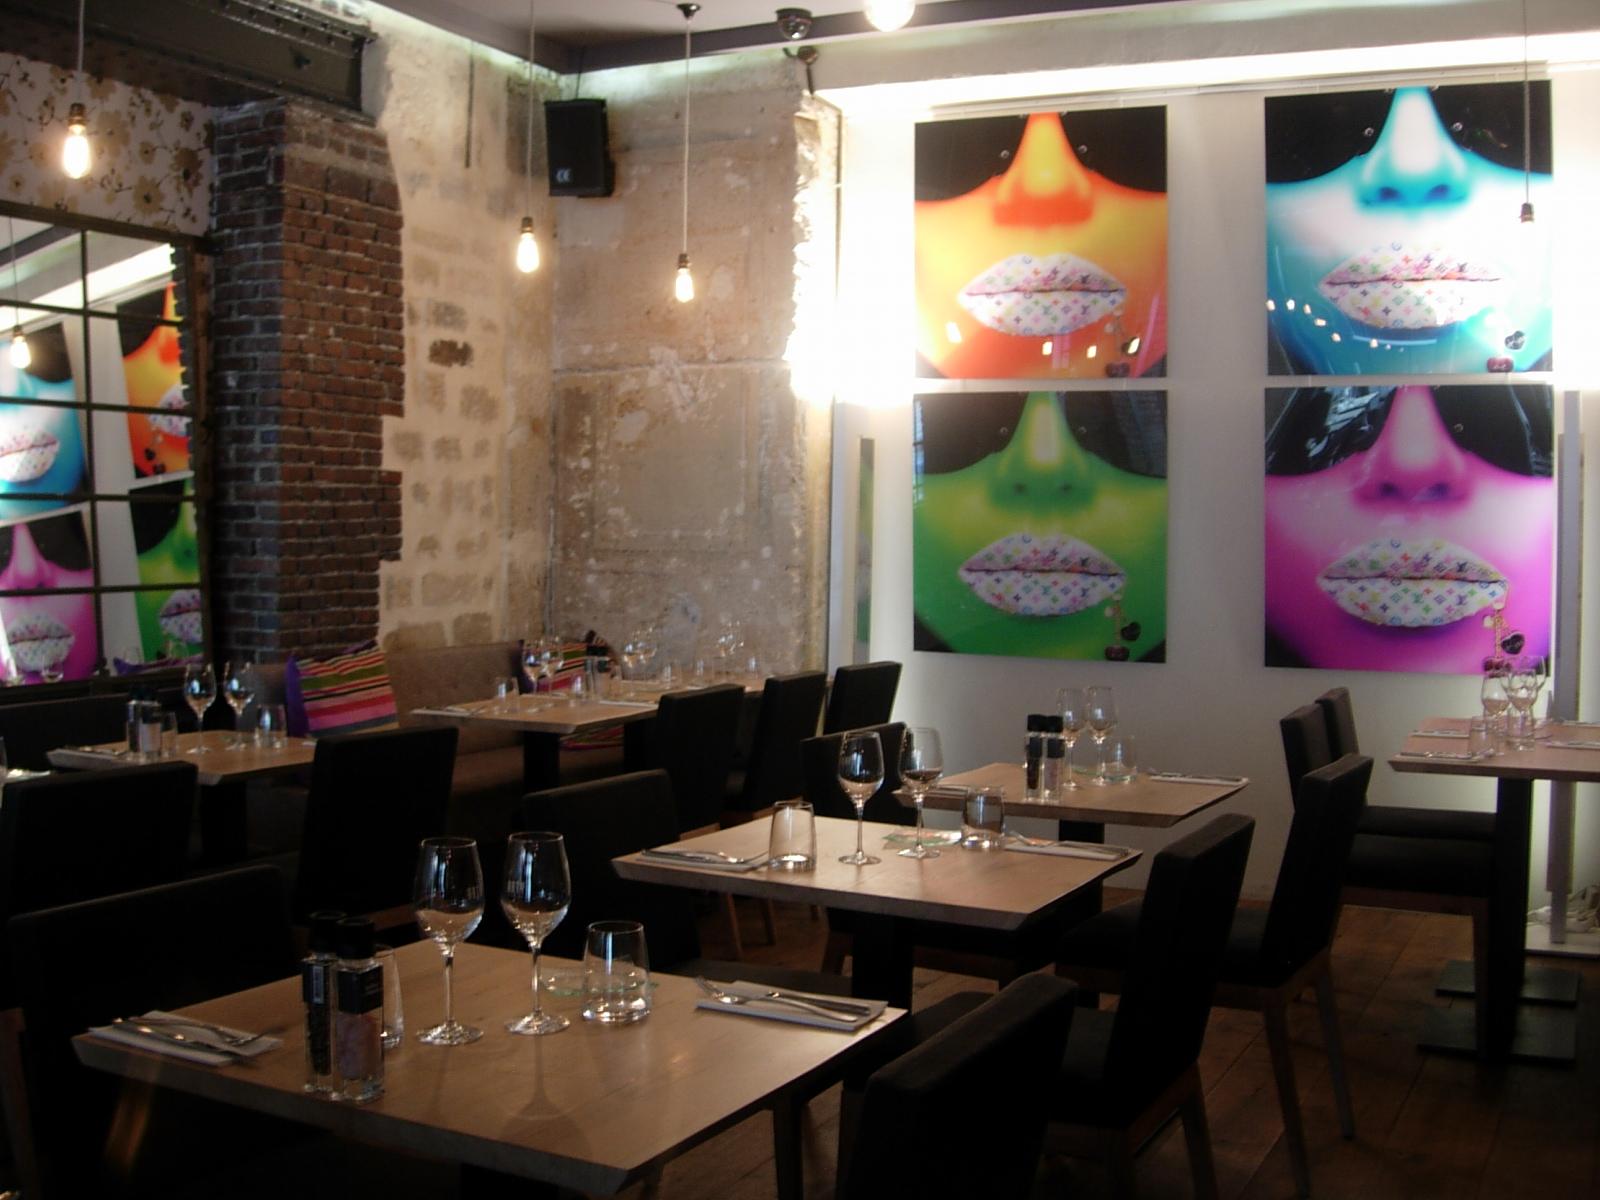 Restaurant Branche Paris The Place To Be